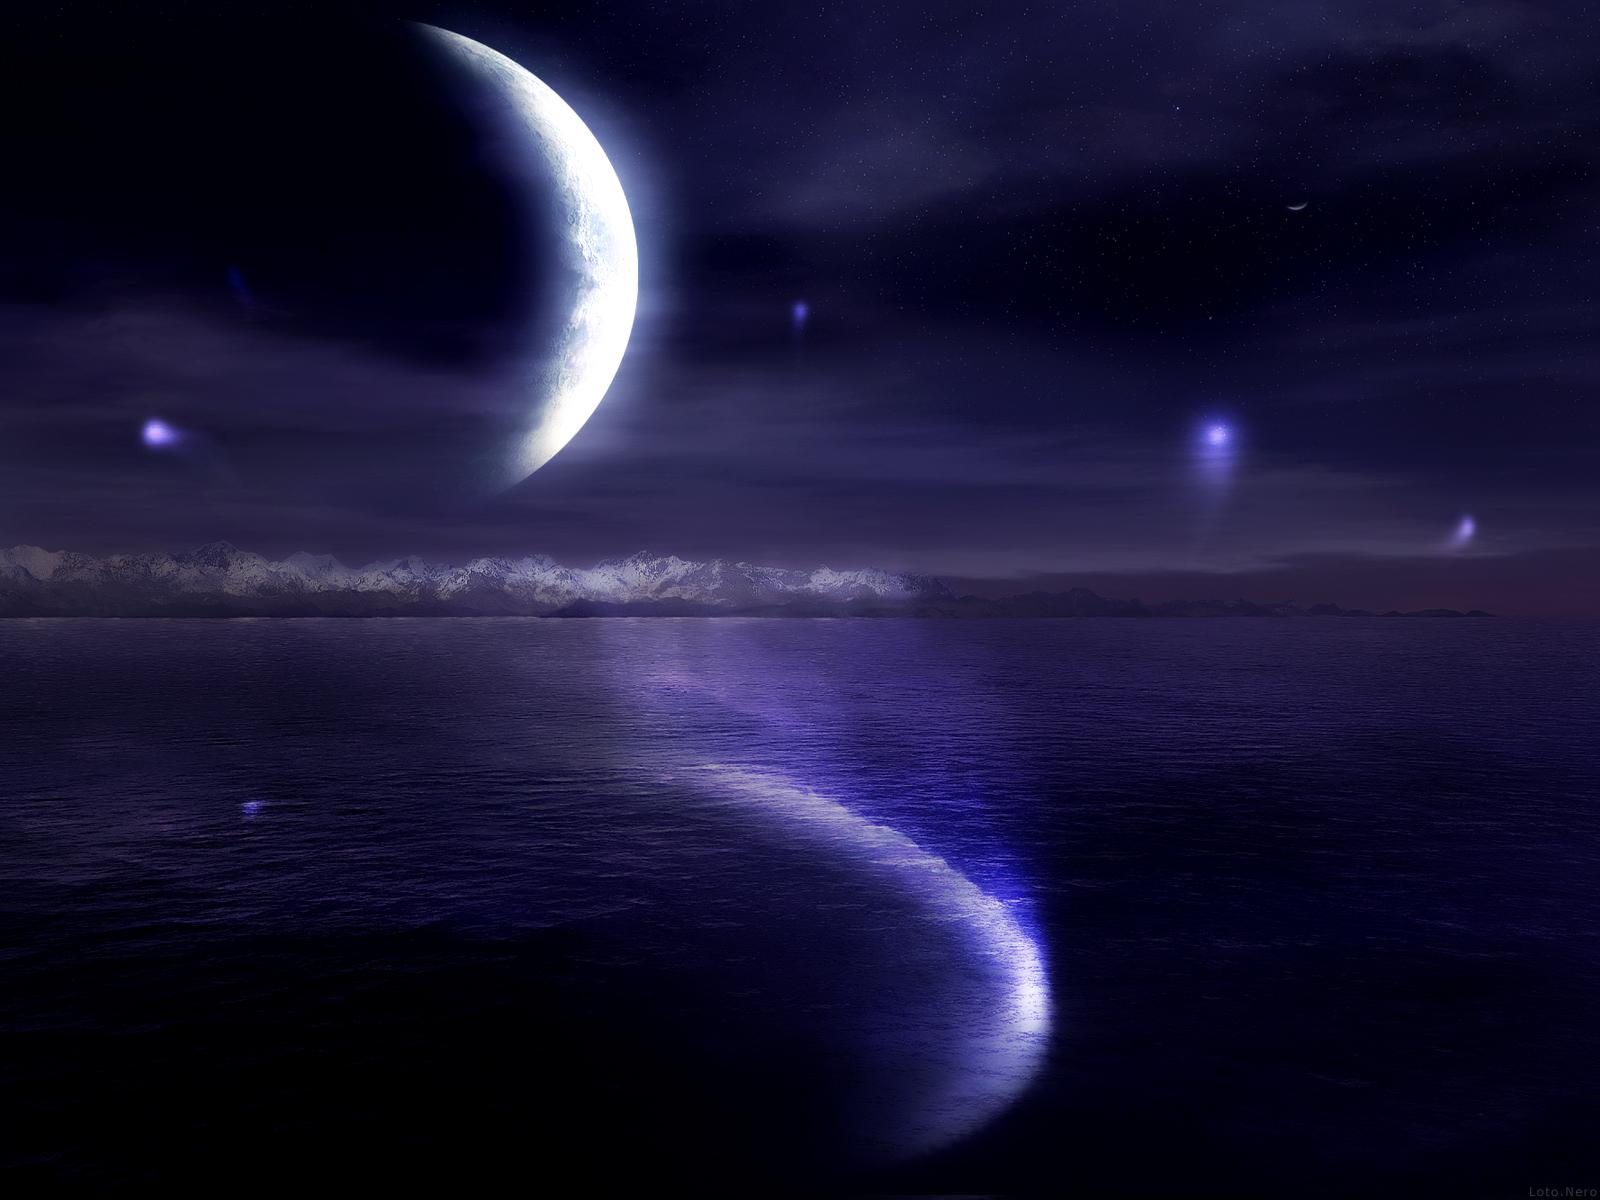 http://1.bp.blogspot.com/-MkVpEm9tqc0/UJHWcUTPzNI/AAAAAAAAClA/MGRPKbWurAk/s1600/Moonlight_Shadow___Wallpaper_by_lotonero.jpg